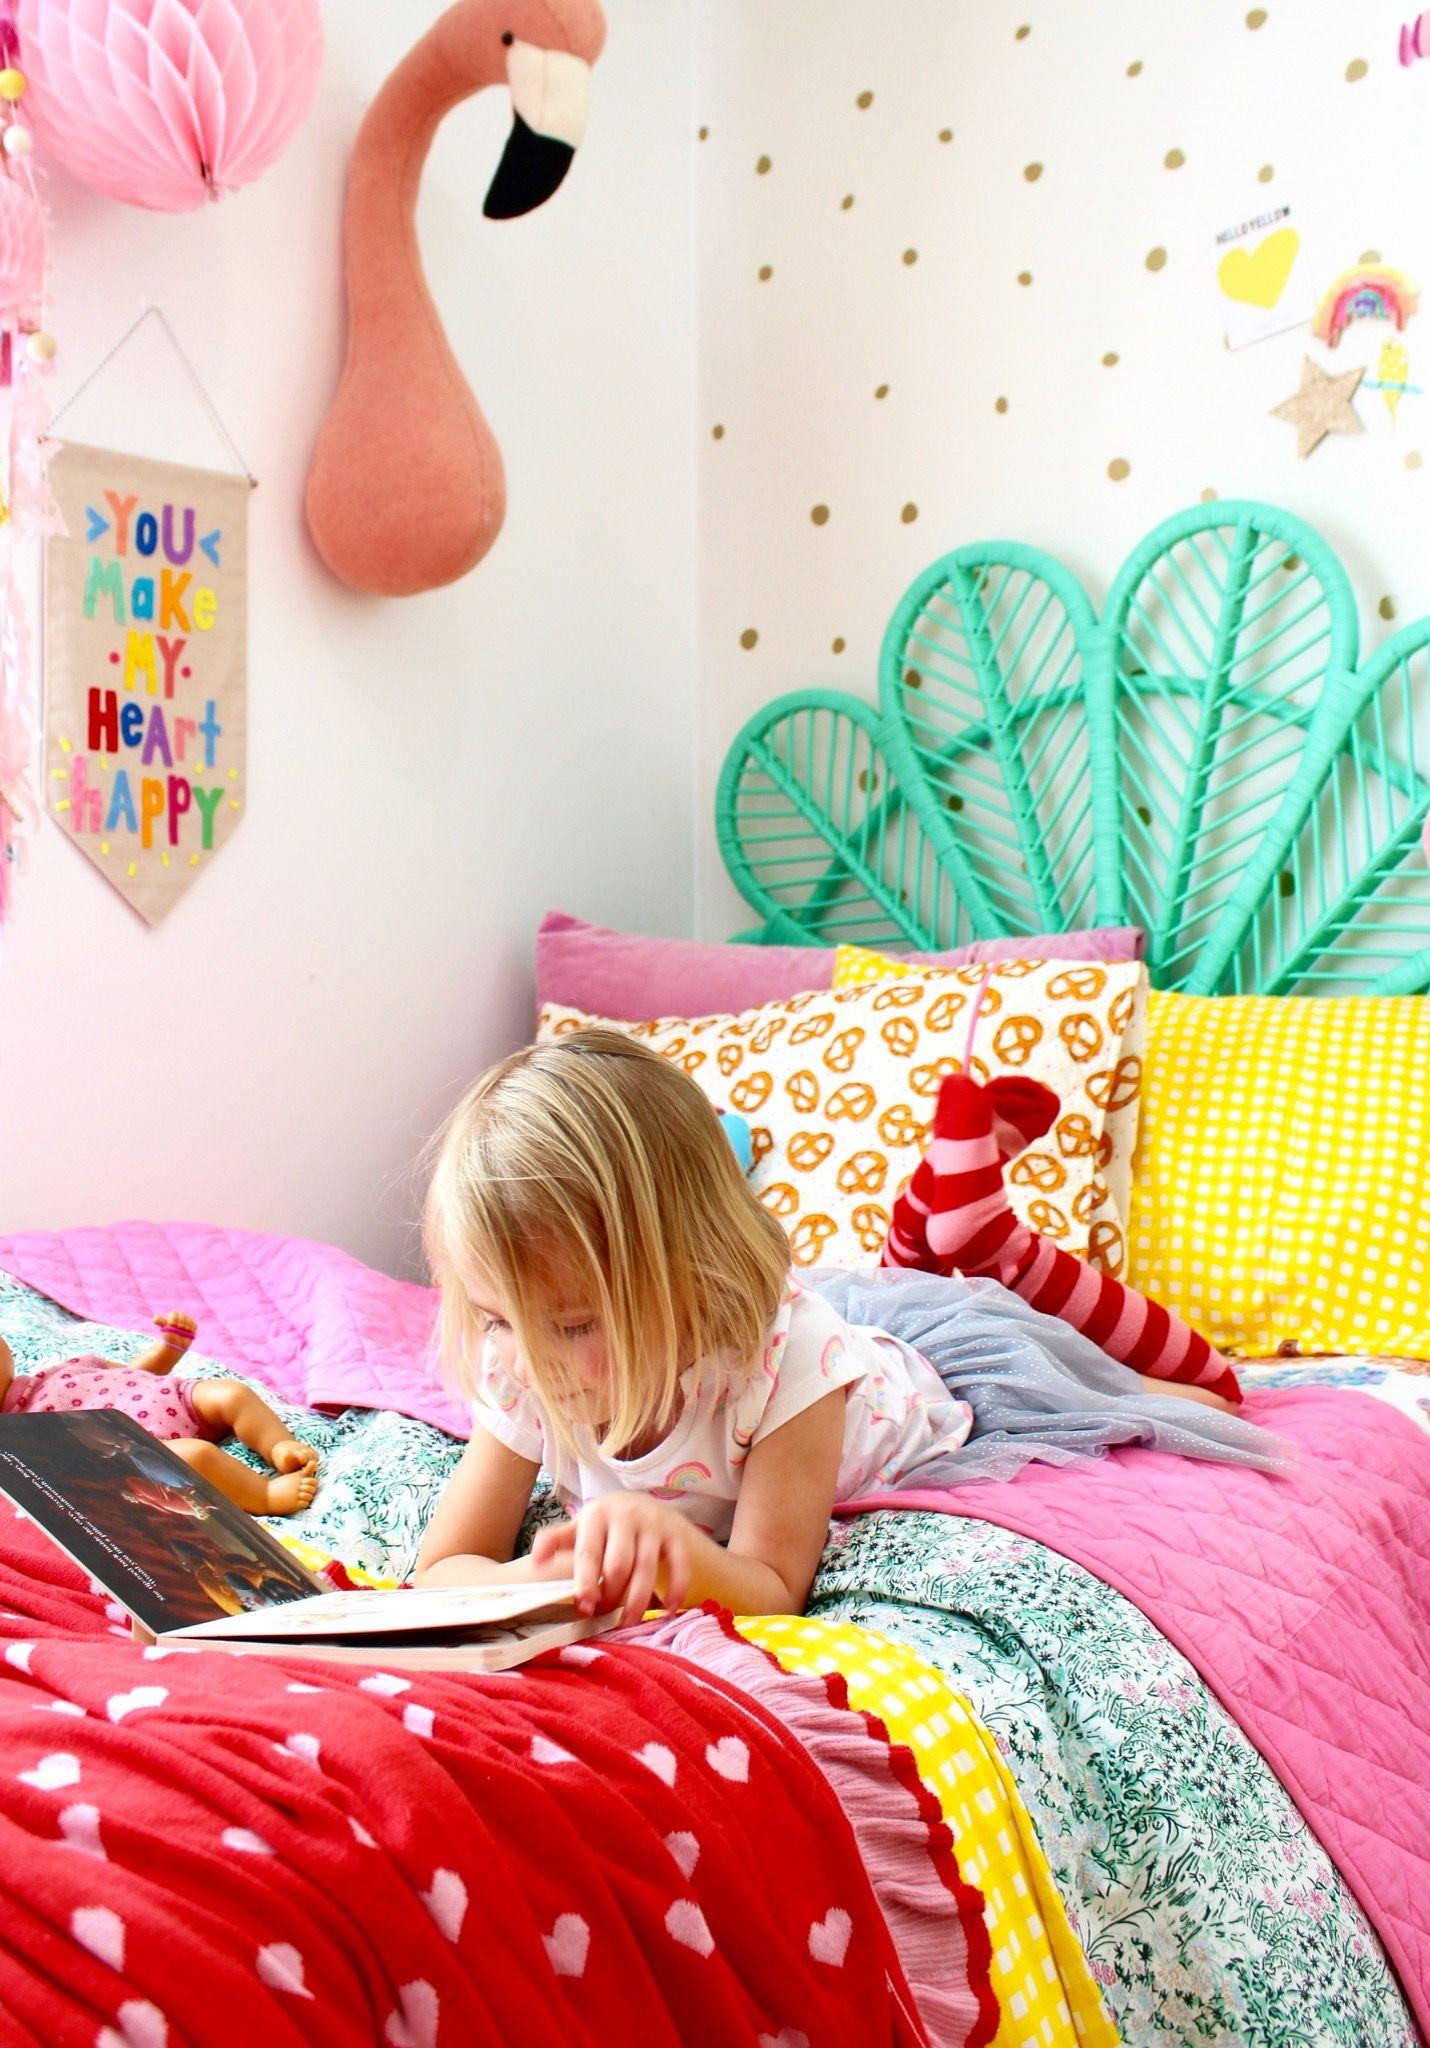 Kids Bedroom Ideas Rainbow Retreat Four Cheeky Monkeys Girls Bedroom Bright Colorful Kids Room Toddler Bedroom Girl